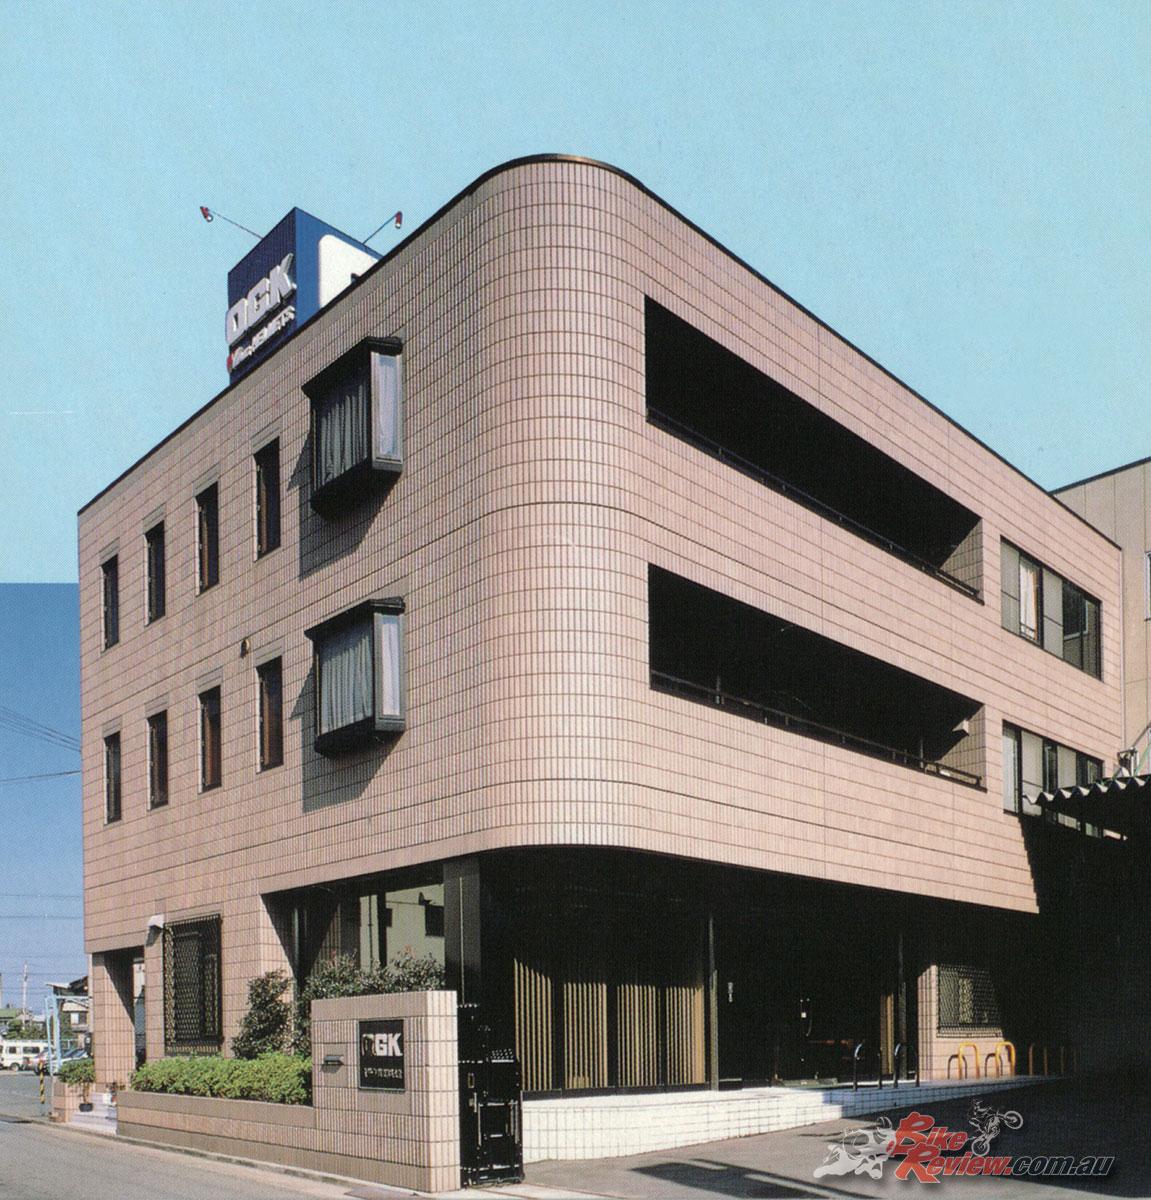 Kabuto's Mikuriya Head Office opened in 1986